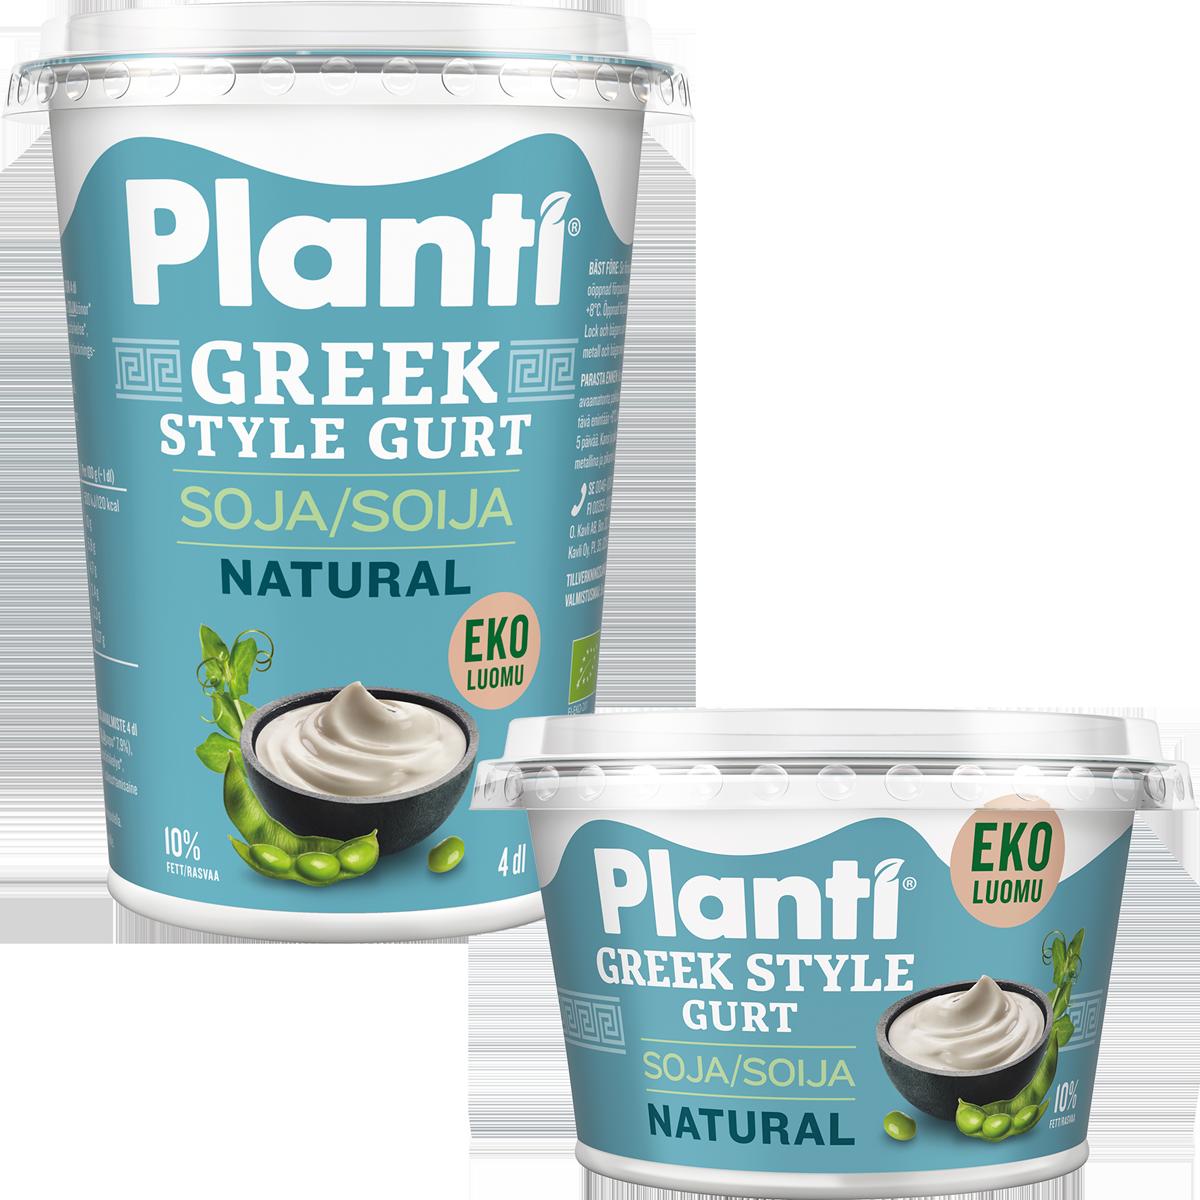 Planti Greek Style Gurt Natural EKO